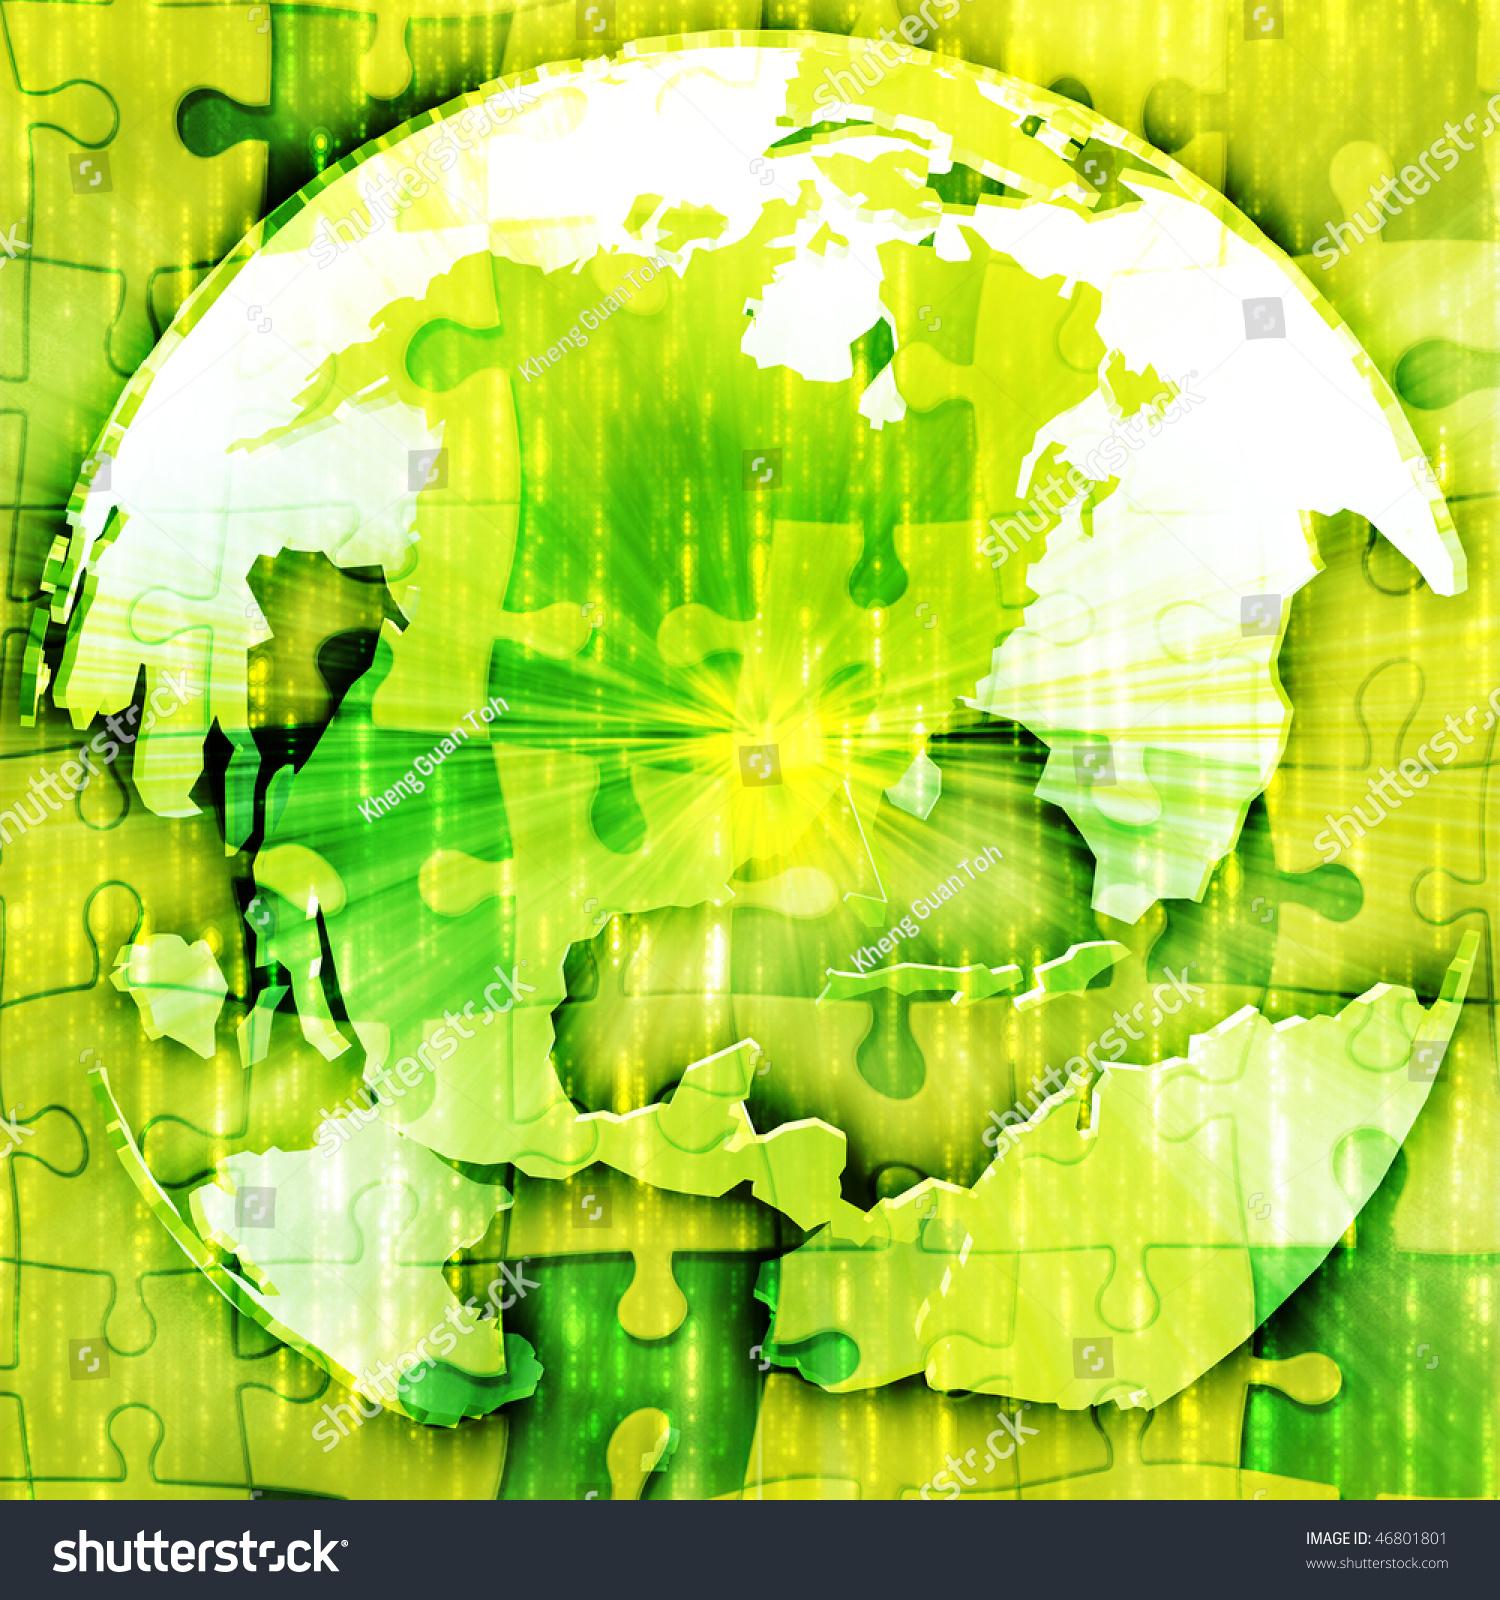 Map americason spherical globe jigsaw puzzle stock illustration map of the americason spherical globe jigsaw puzzle gumiabroncs Image collections